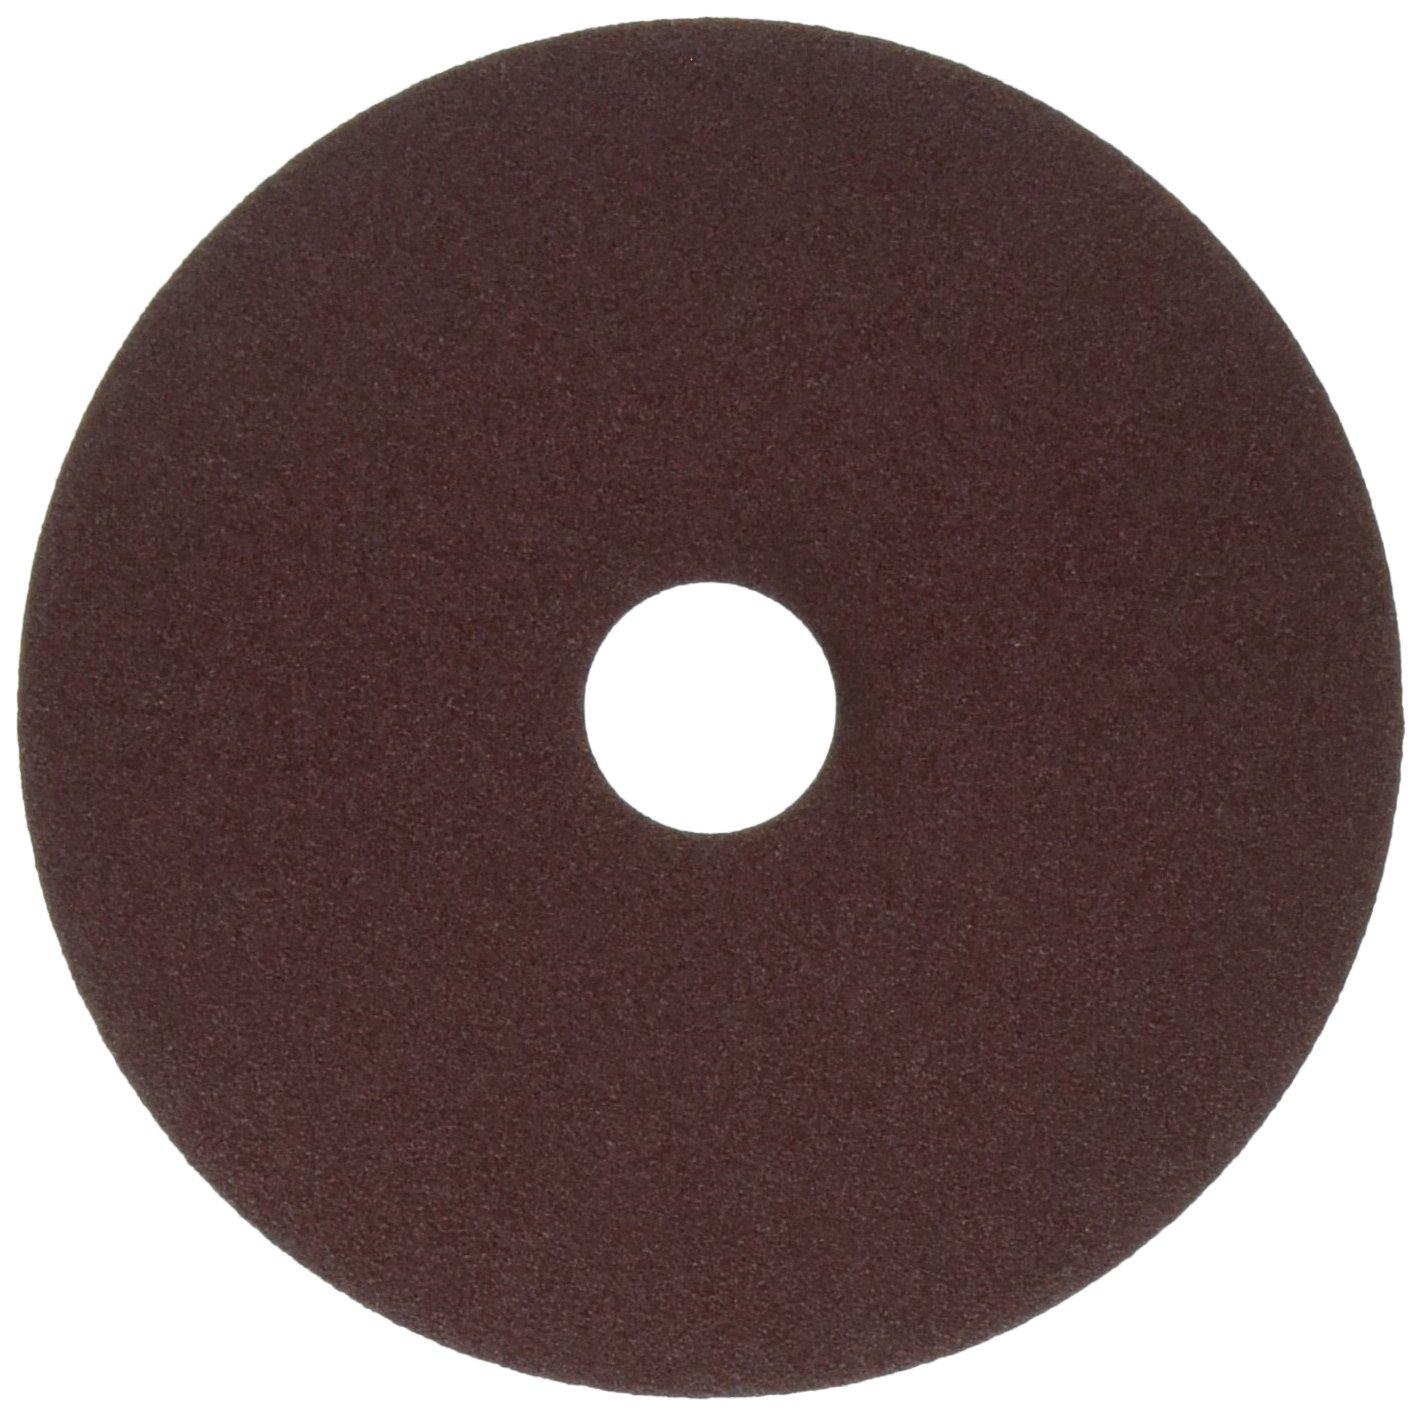 United Abrasives-SAIT 53100 SAIT Fiber Disc, 2A 5 X 7/8 100X Bulk Disc, 100 Pack